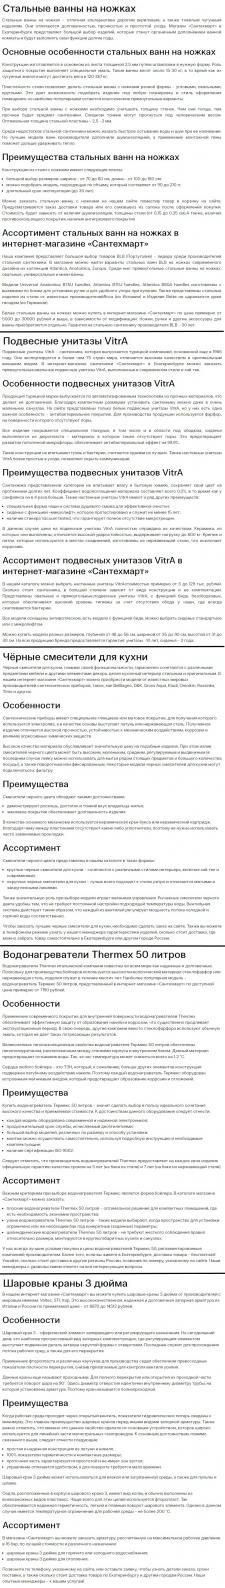 "САНТЕХНИКА | Гипермаркет сантехники ""Сантехмарт"""